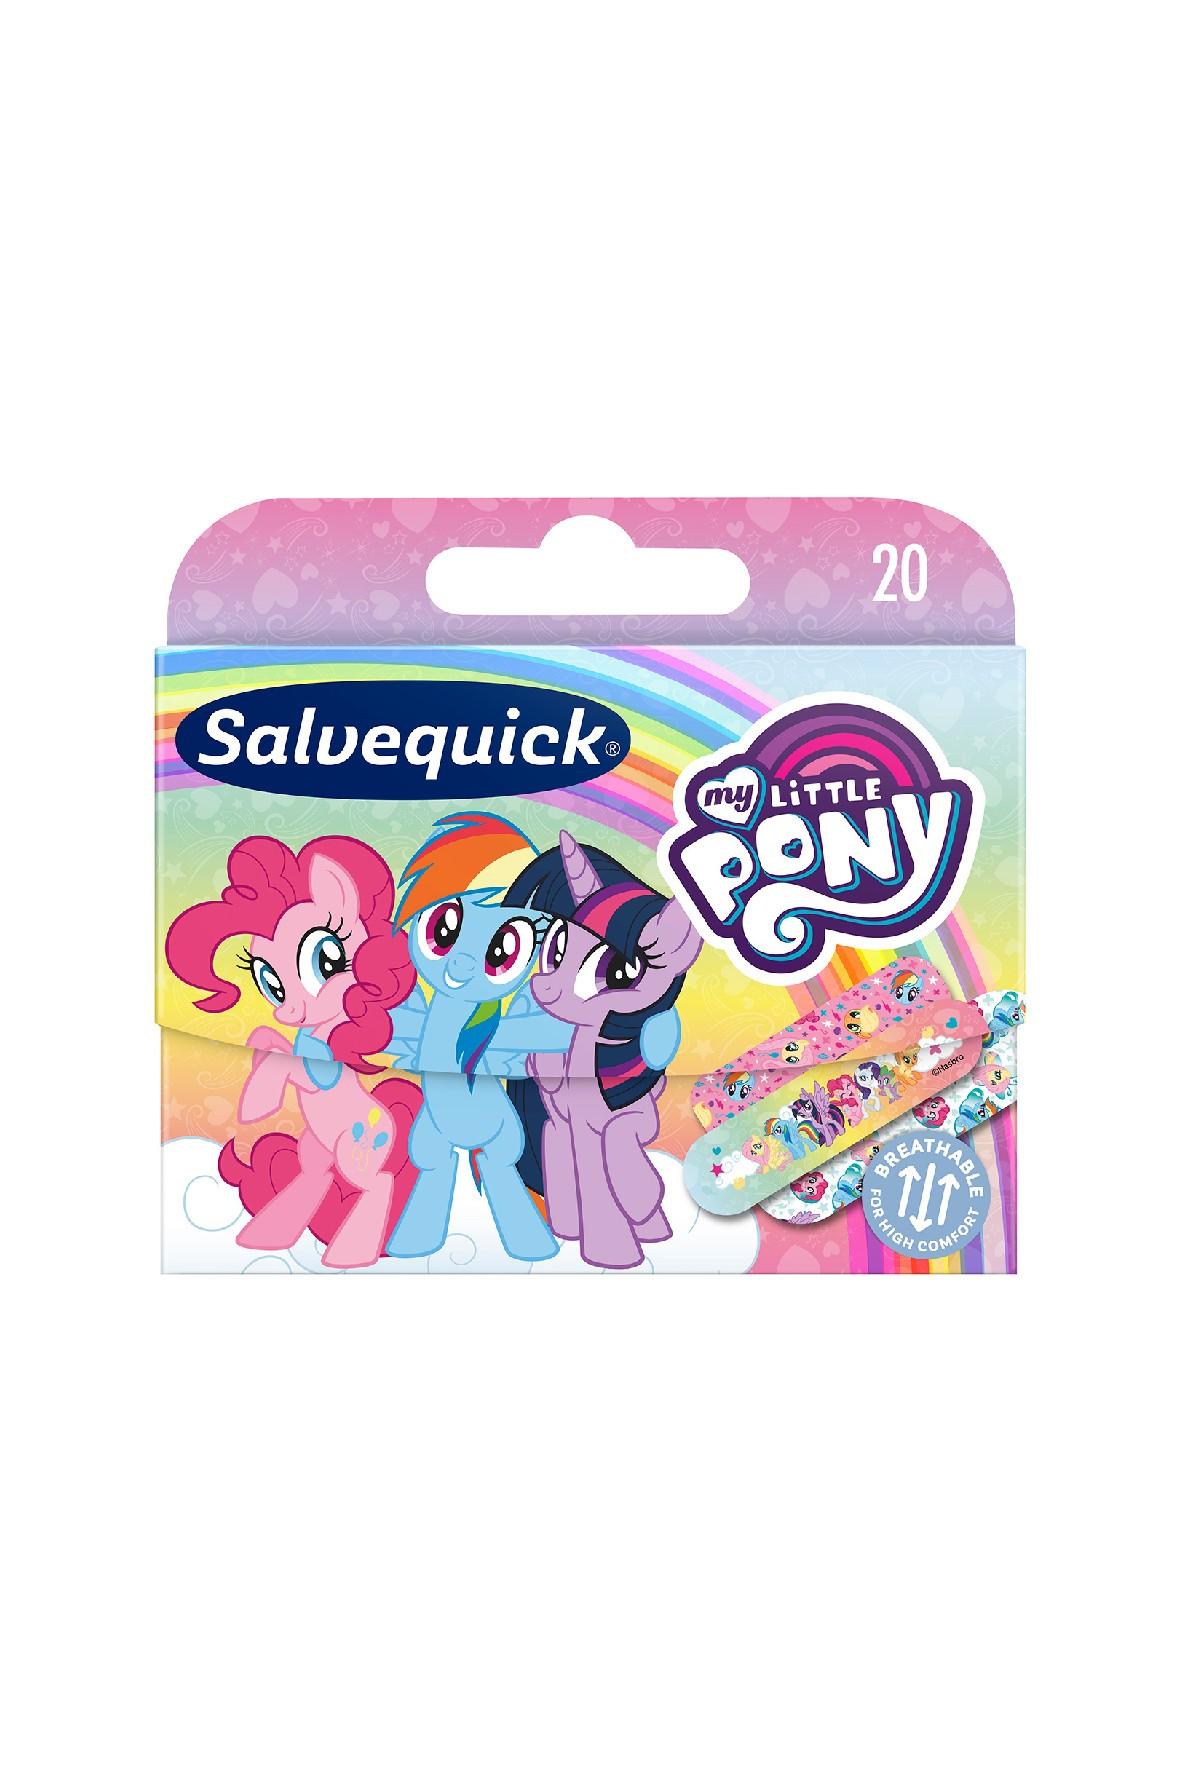 Salvequick KIDS plastry opatrunkowe My little pony 20 szt.